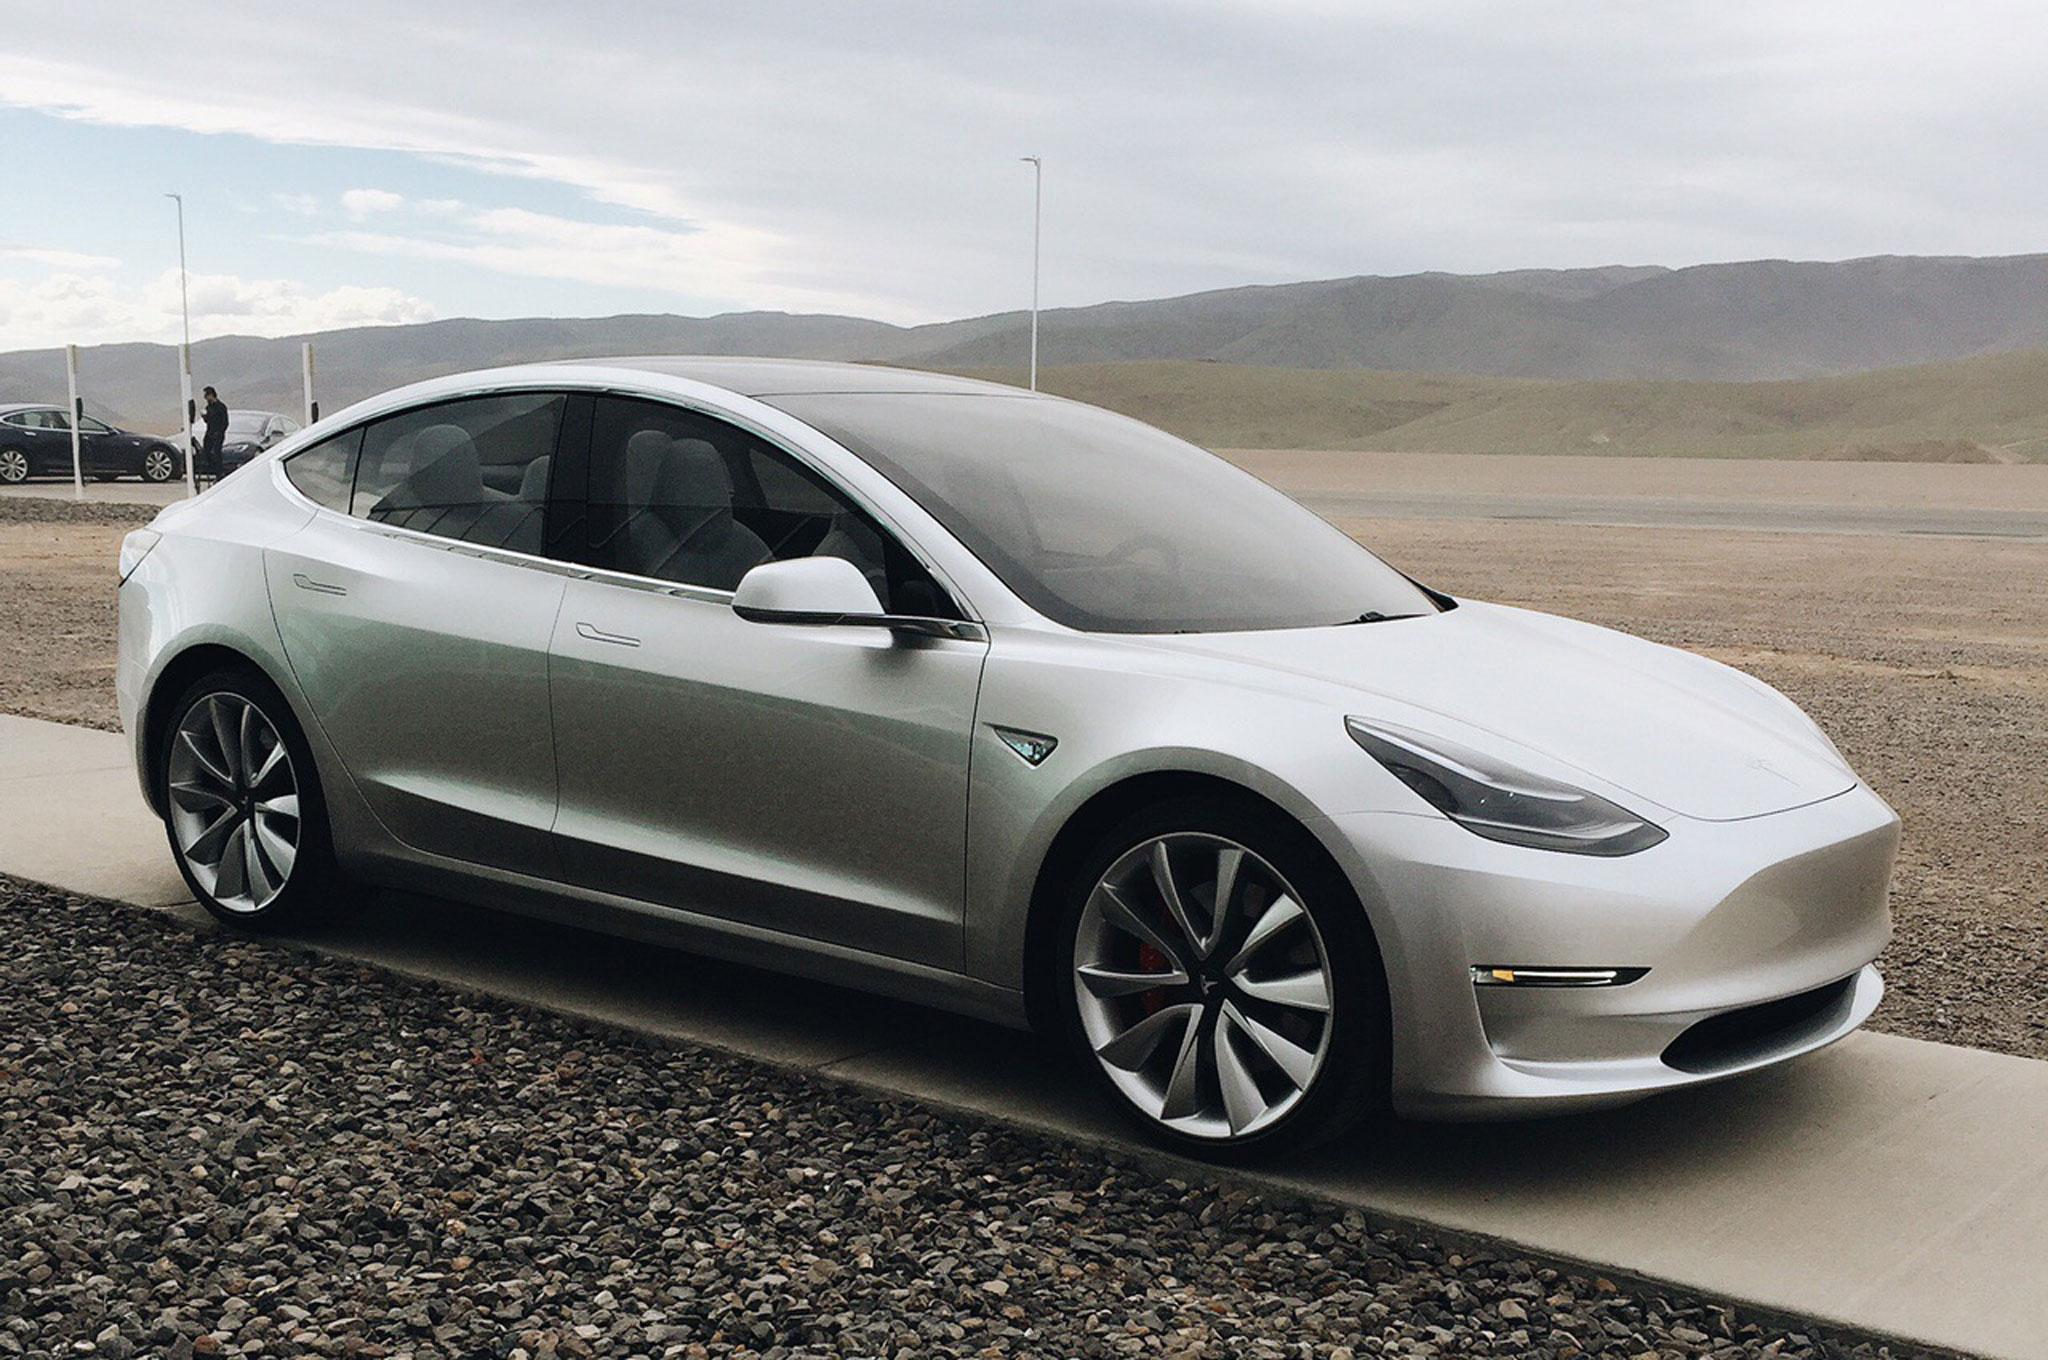 Tesla Electric Car Price In Pakistan